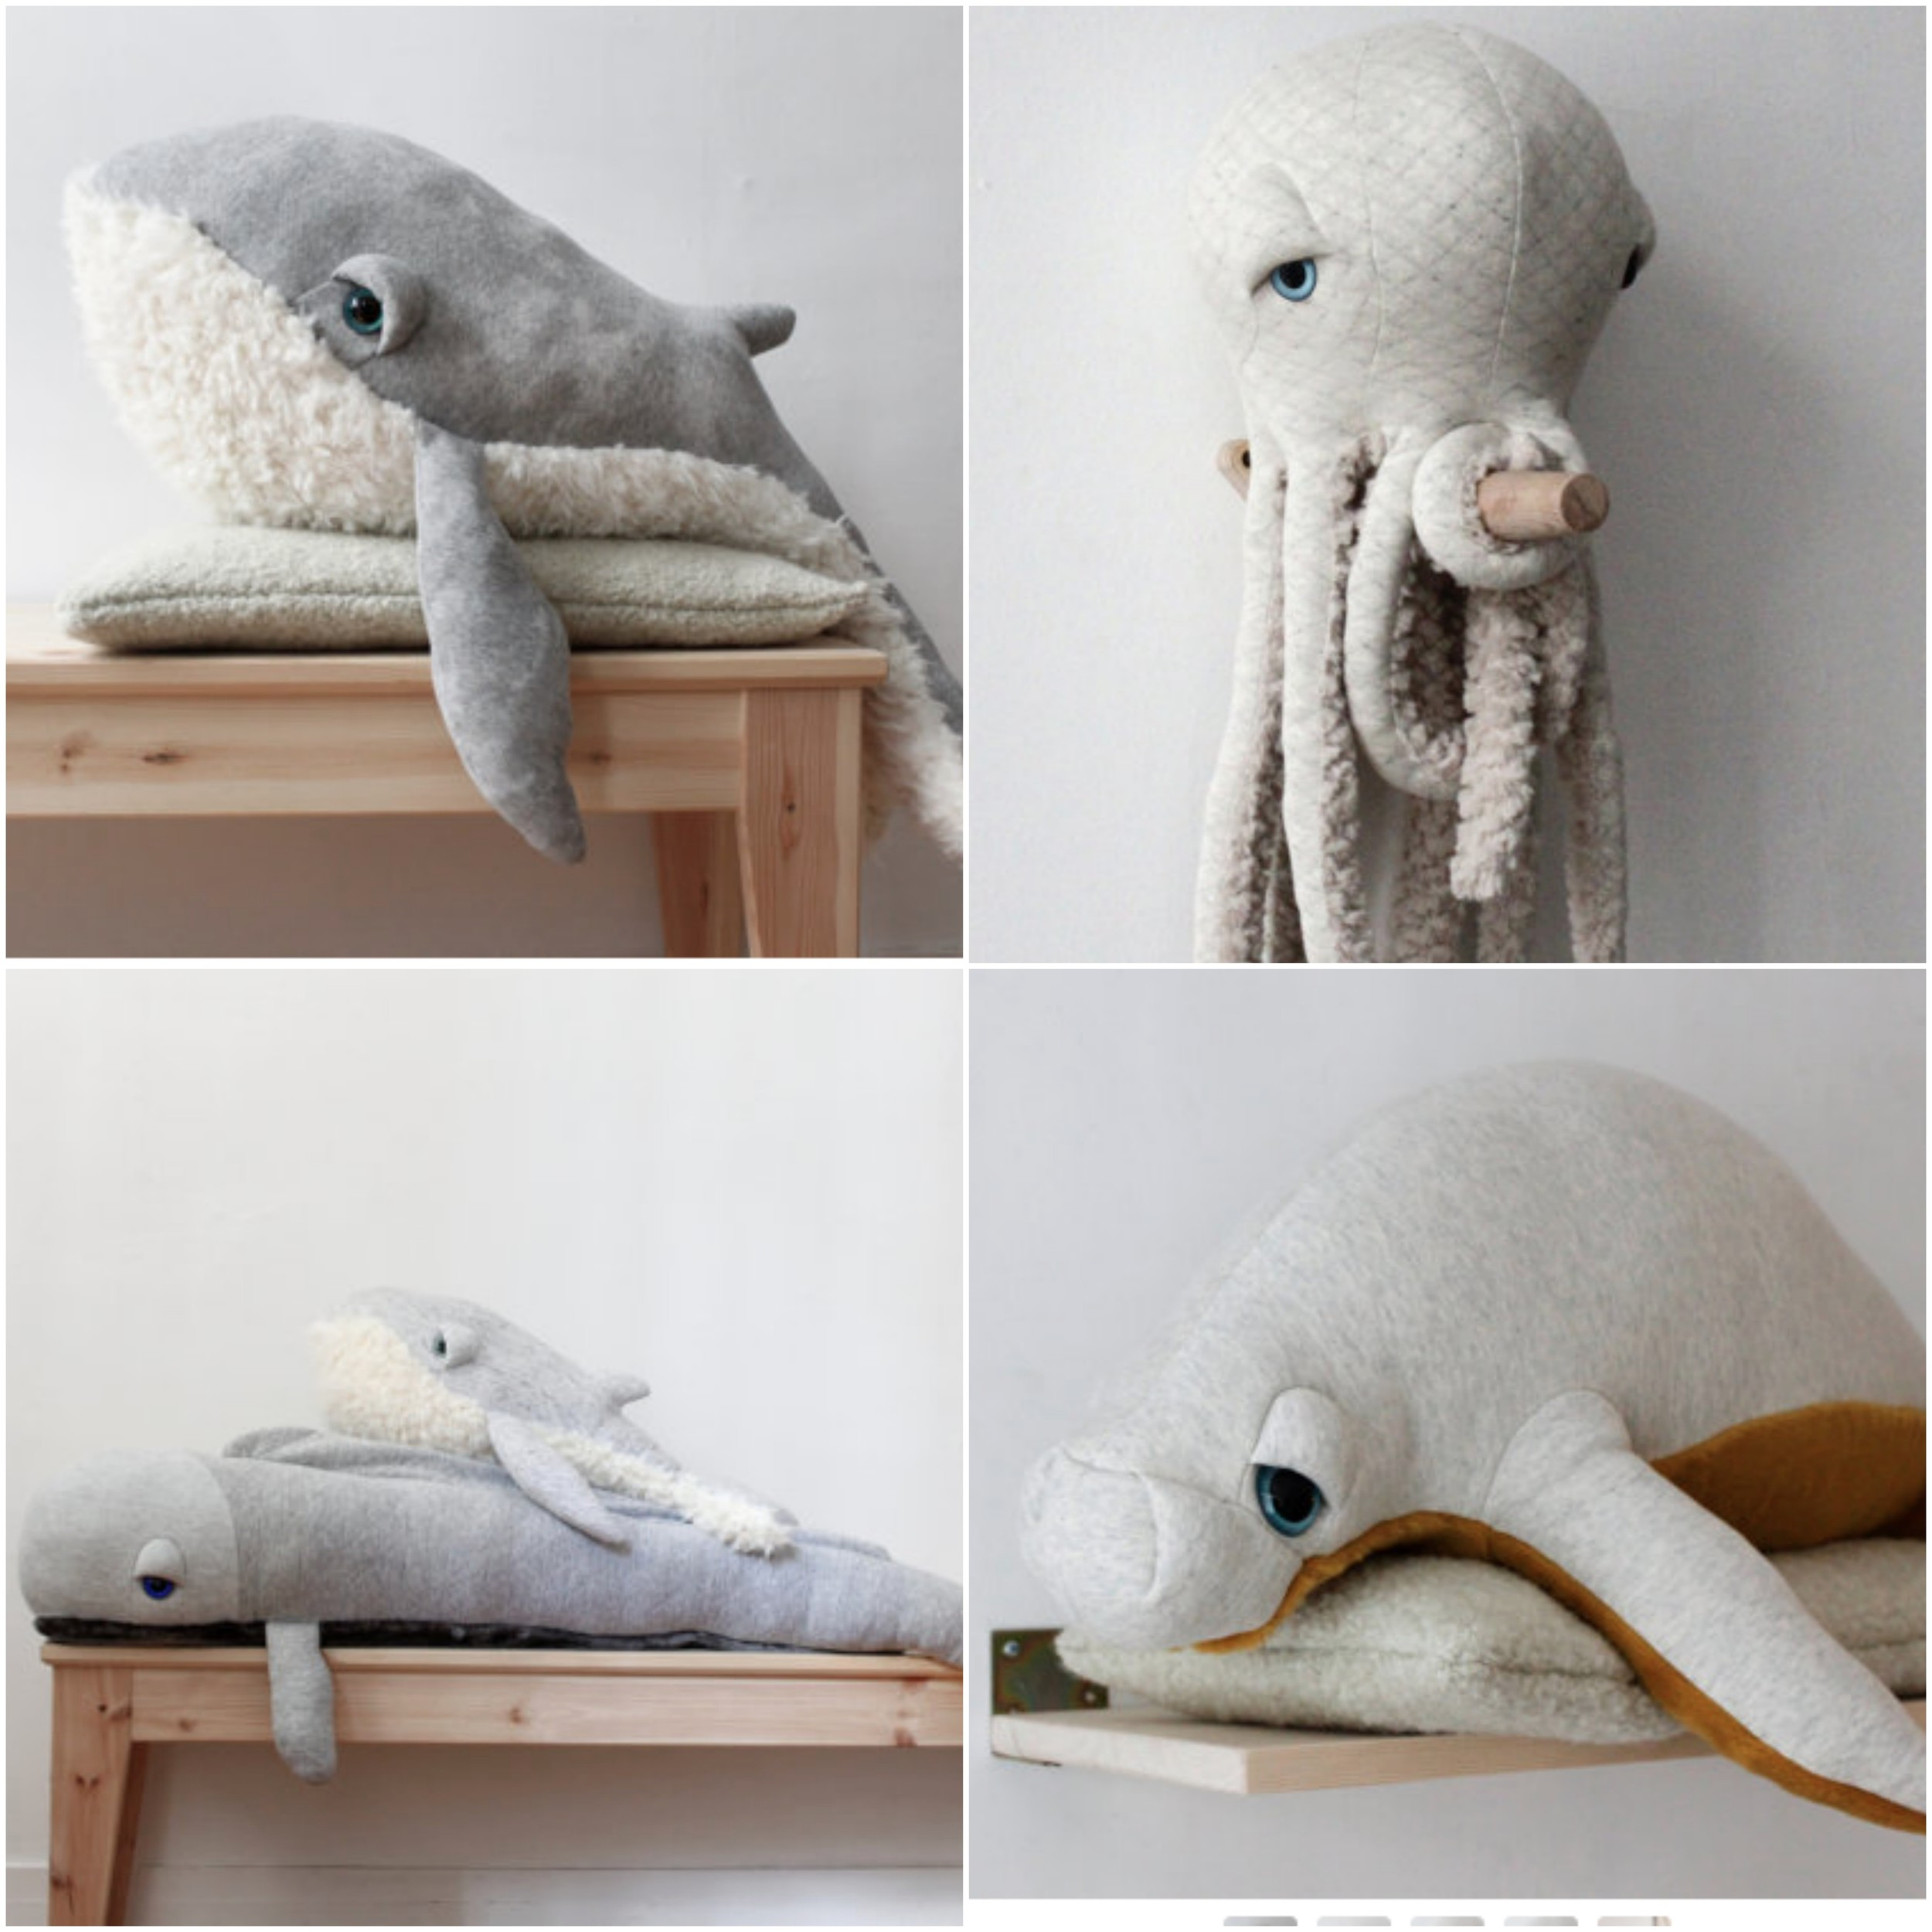 Now I need a stuffed sea animal snuggle induced nap... too good.